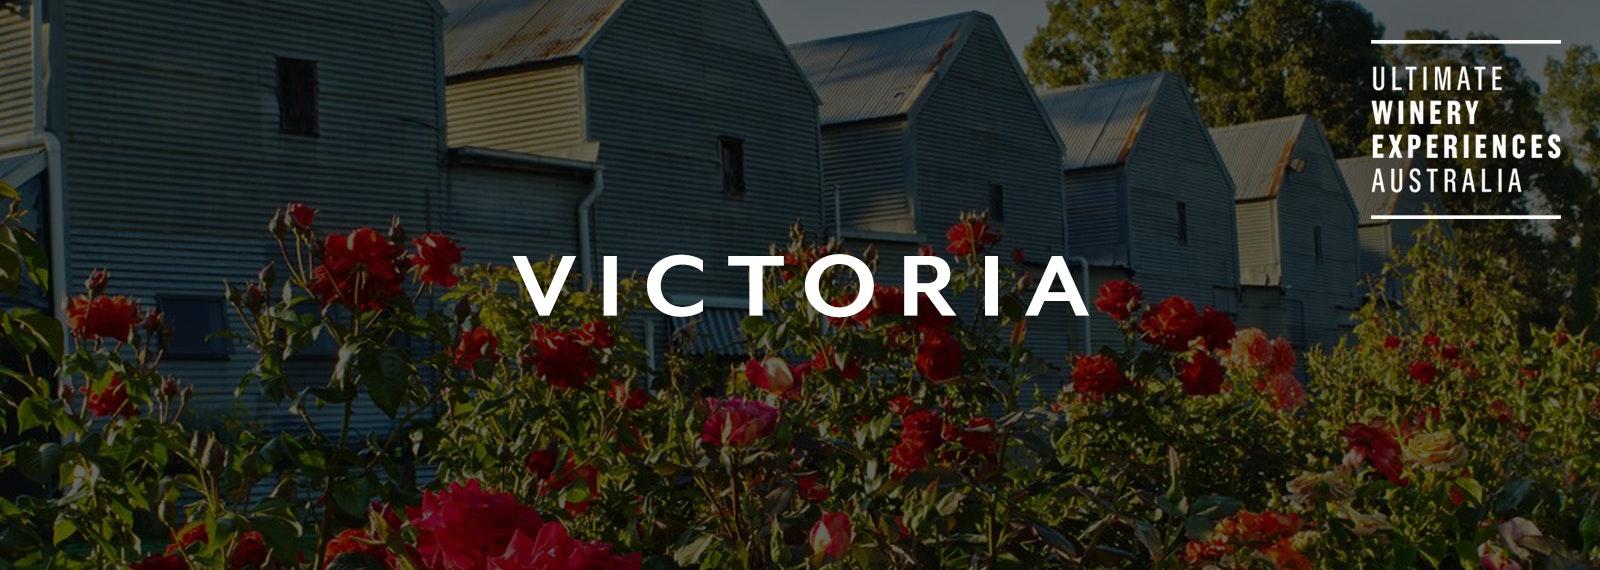 Ultimate Winery Experiences Australia - Victoria